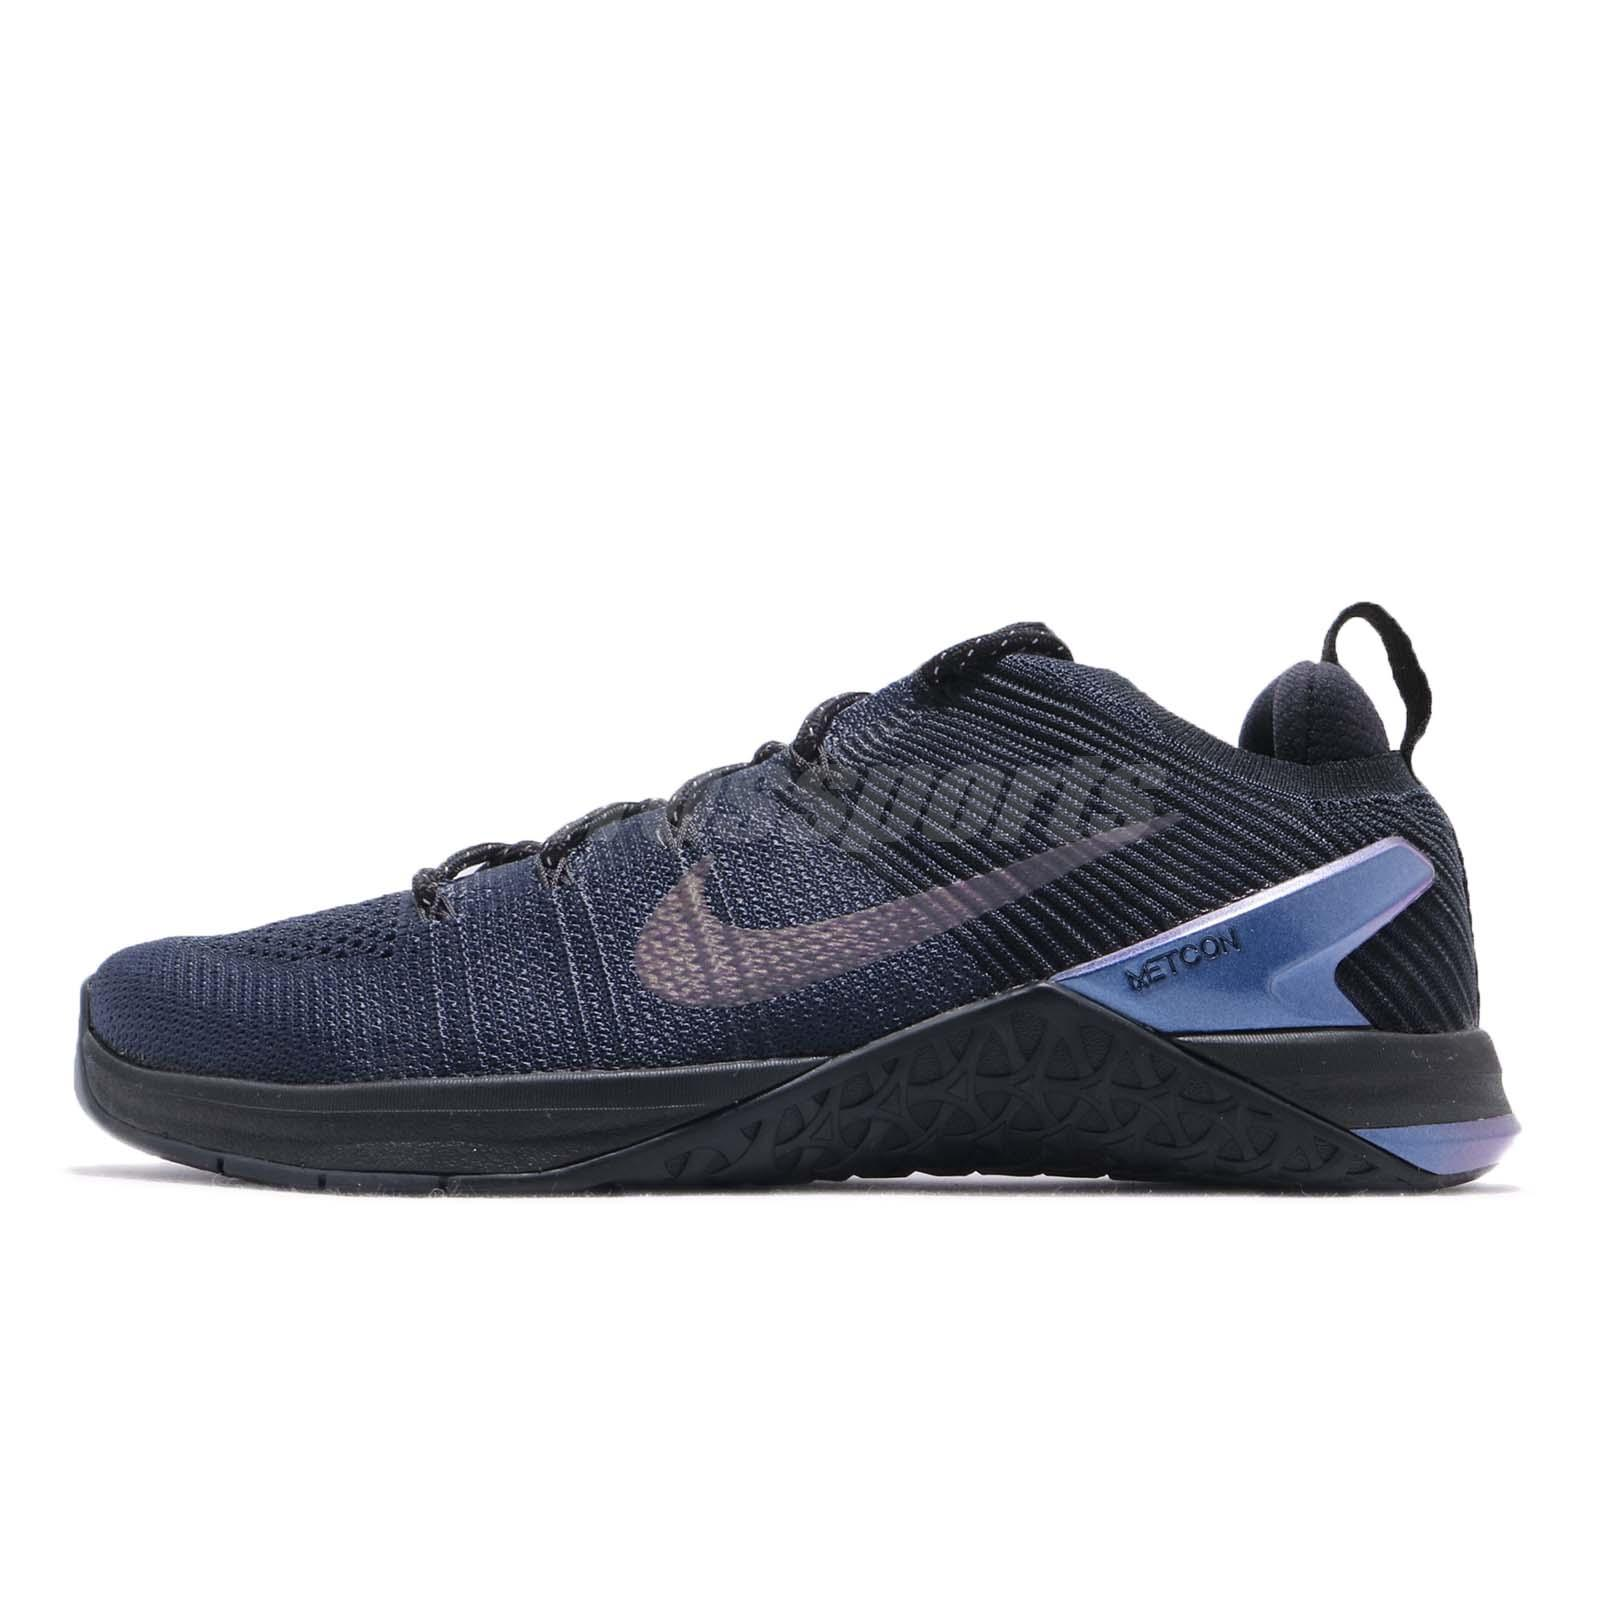 c3feef2d5f6f Nike Metcon DSX Flyknit 2 AMP FK College Navy Blue Training Shoes AV3839-400